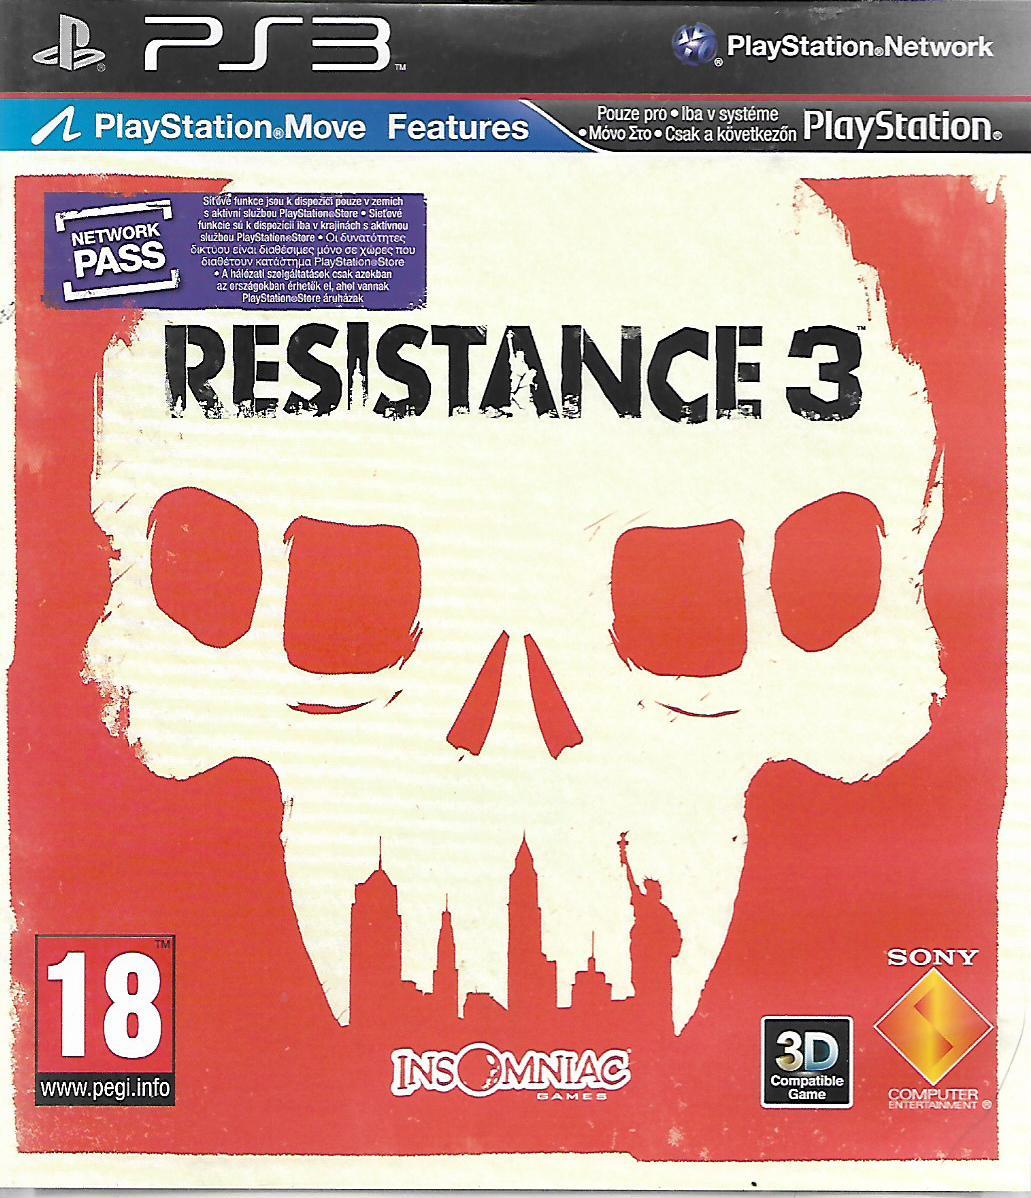 RESISTANCE 3 (PS3 - bazar)